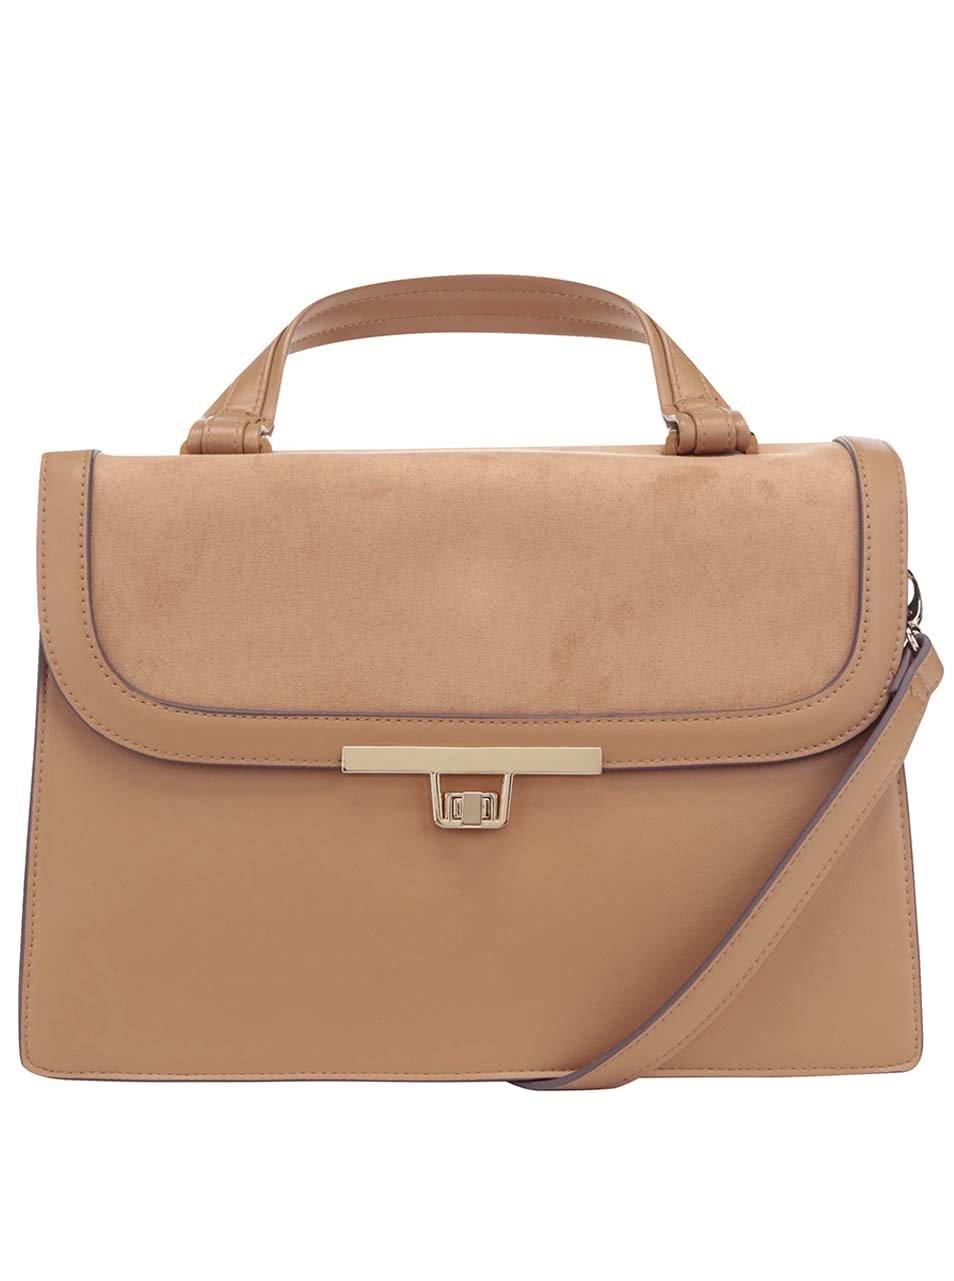 Béžová kabelka s popruhem Dorothy Perkins